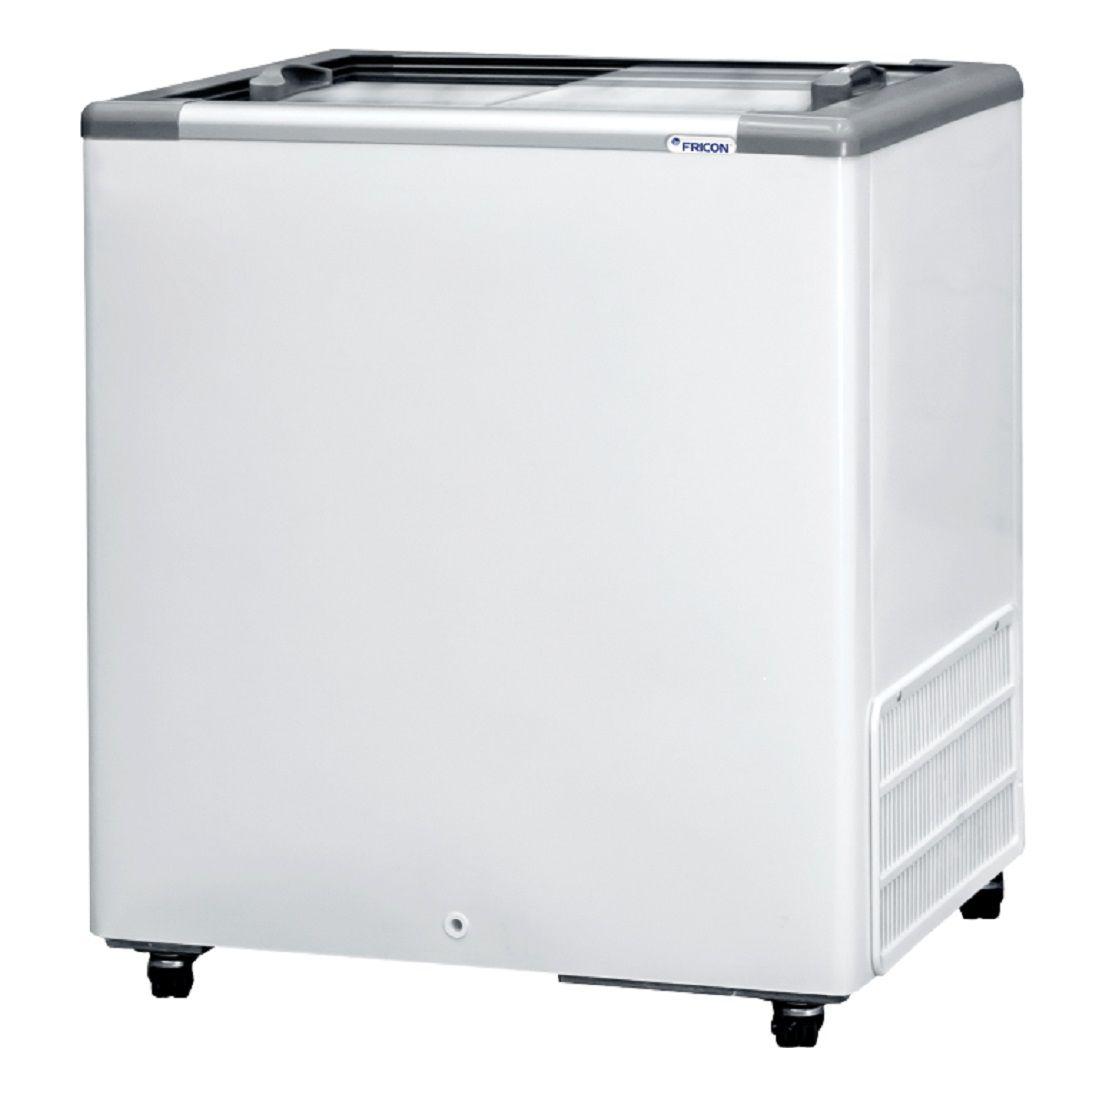 Freezer Expositor Horizontal 216 Litros Tampa de Vidro HCEB-216 220v Fricon